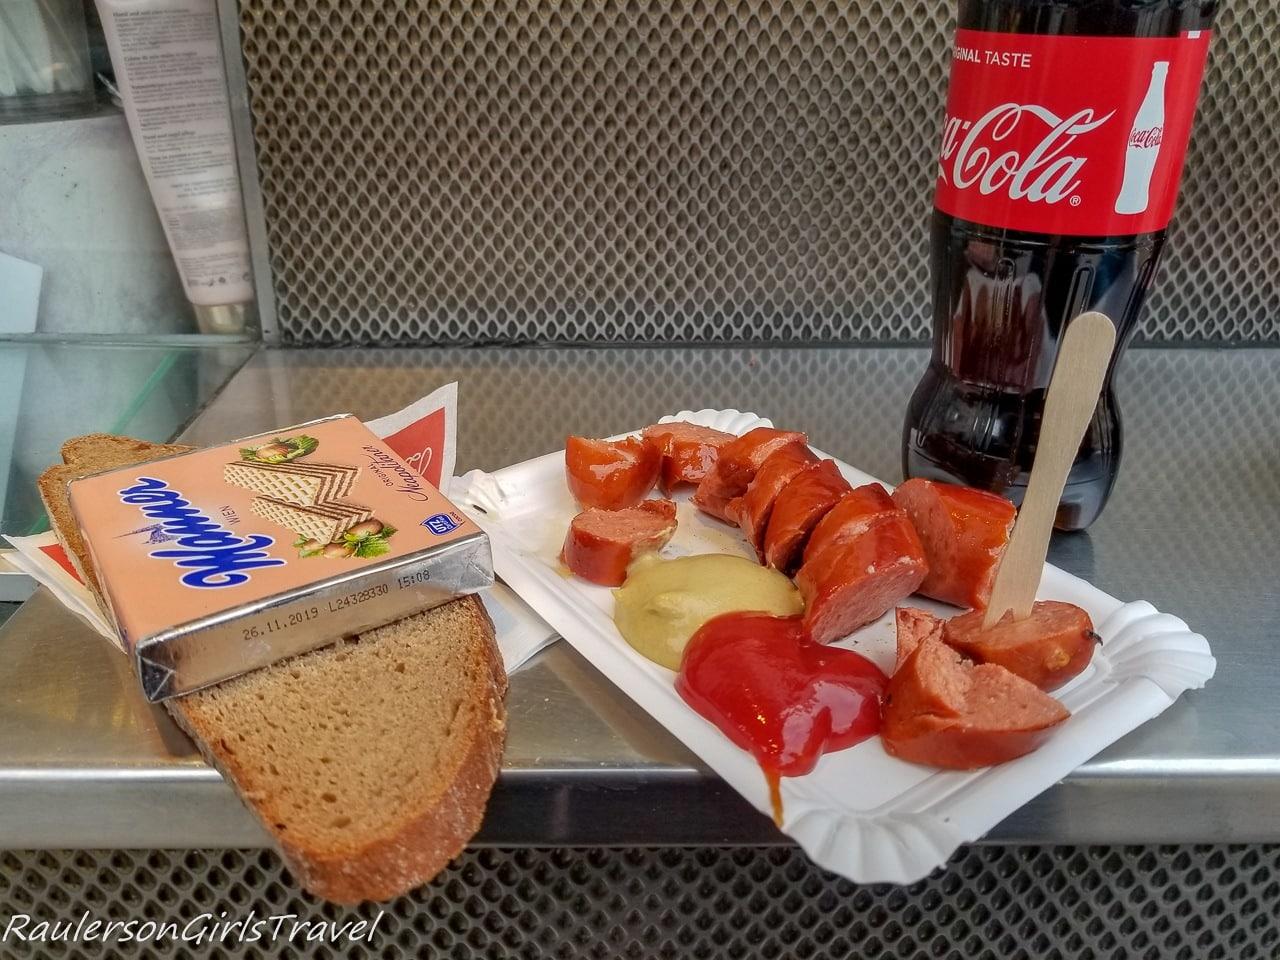 Sausage and a Coke at Bitzinger